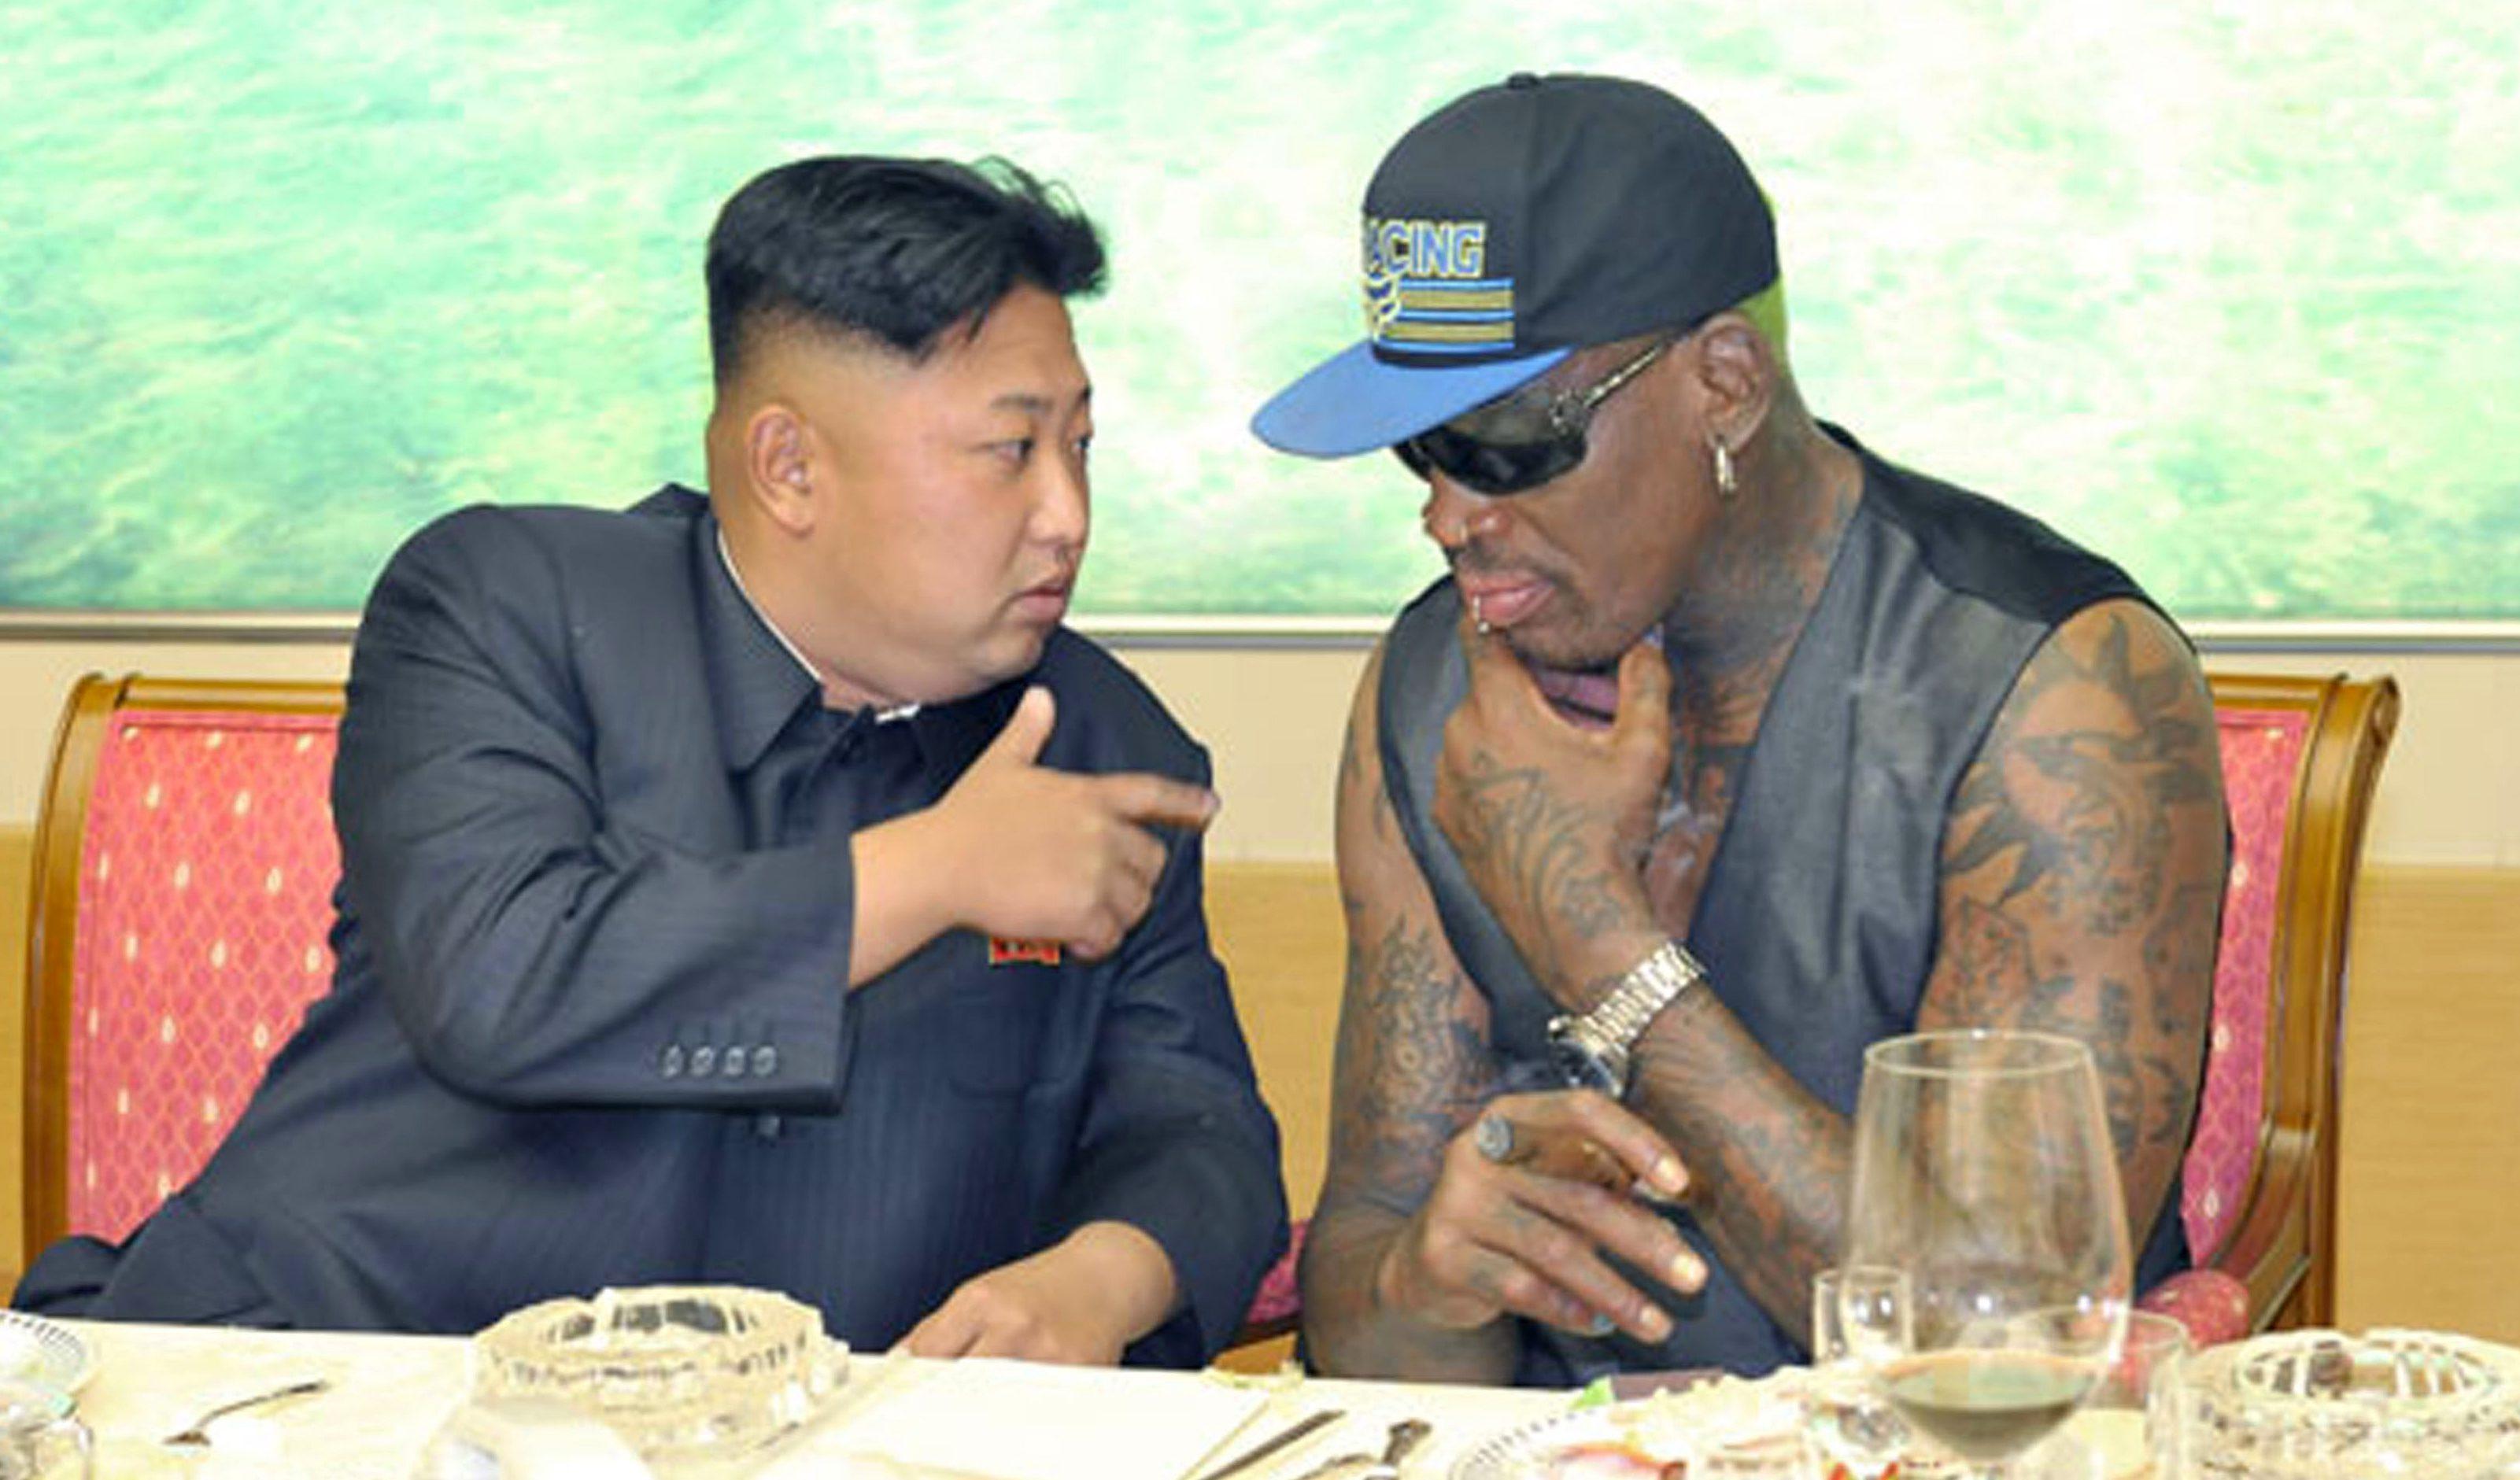 Dennis Rodman I hope Kim Jong Un wears a Make America Great Again hat after meeting Trump